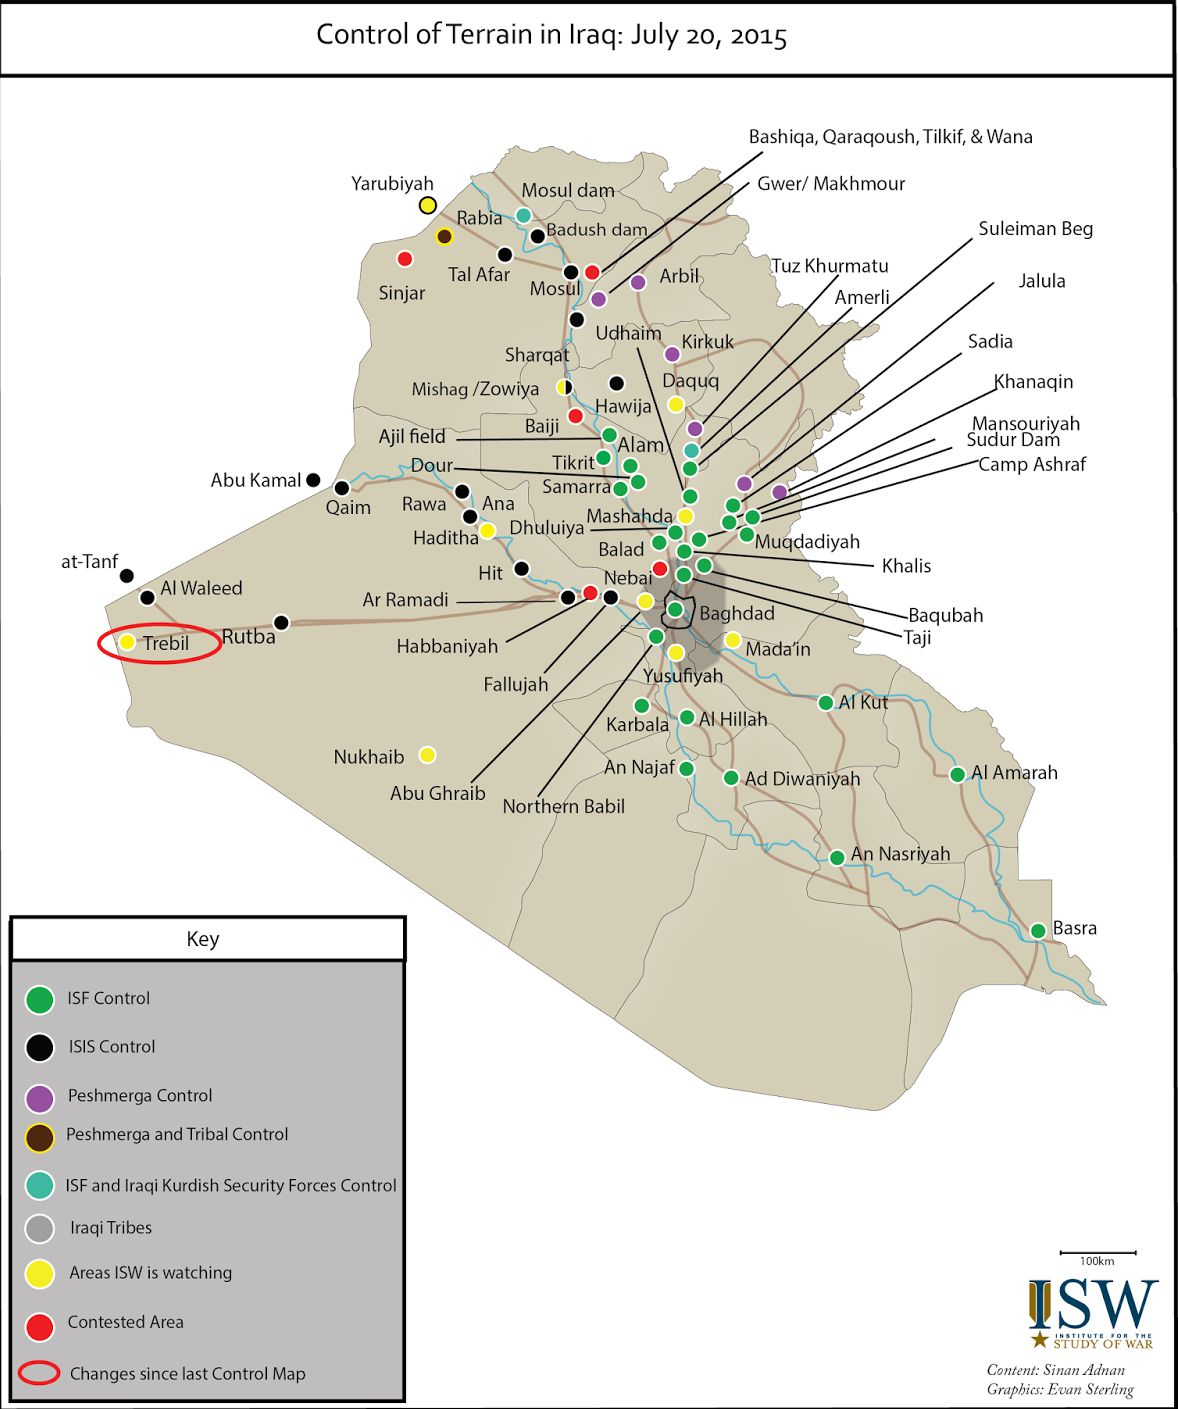 Iraq+Control+Map+2015-7-20+high